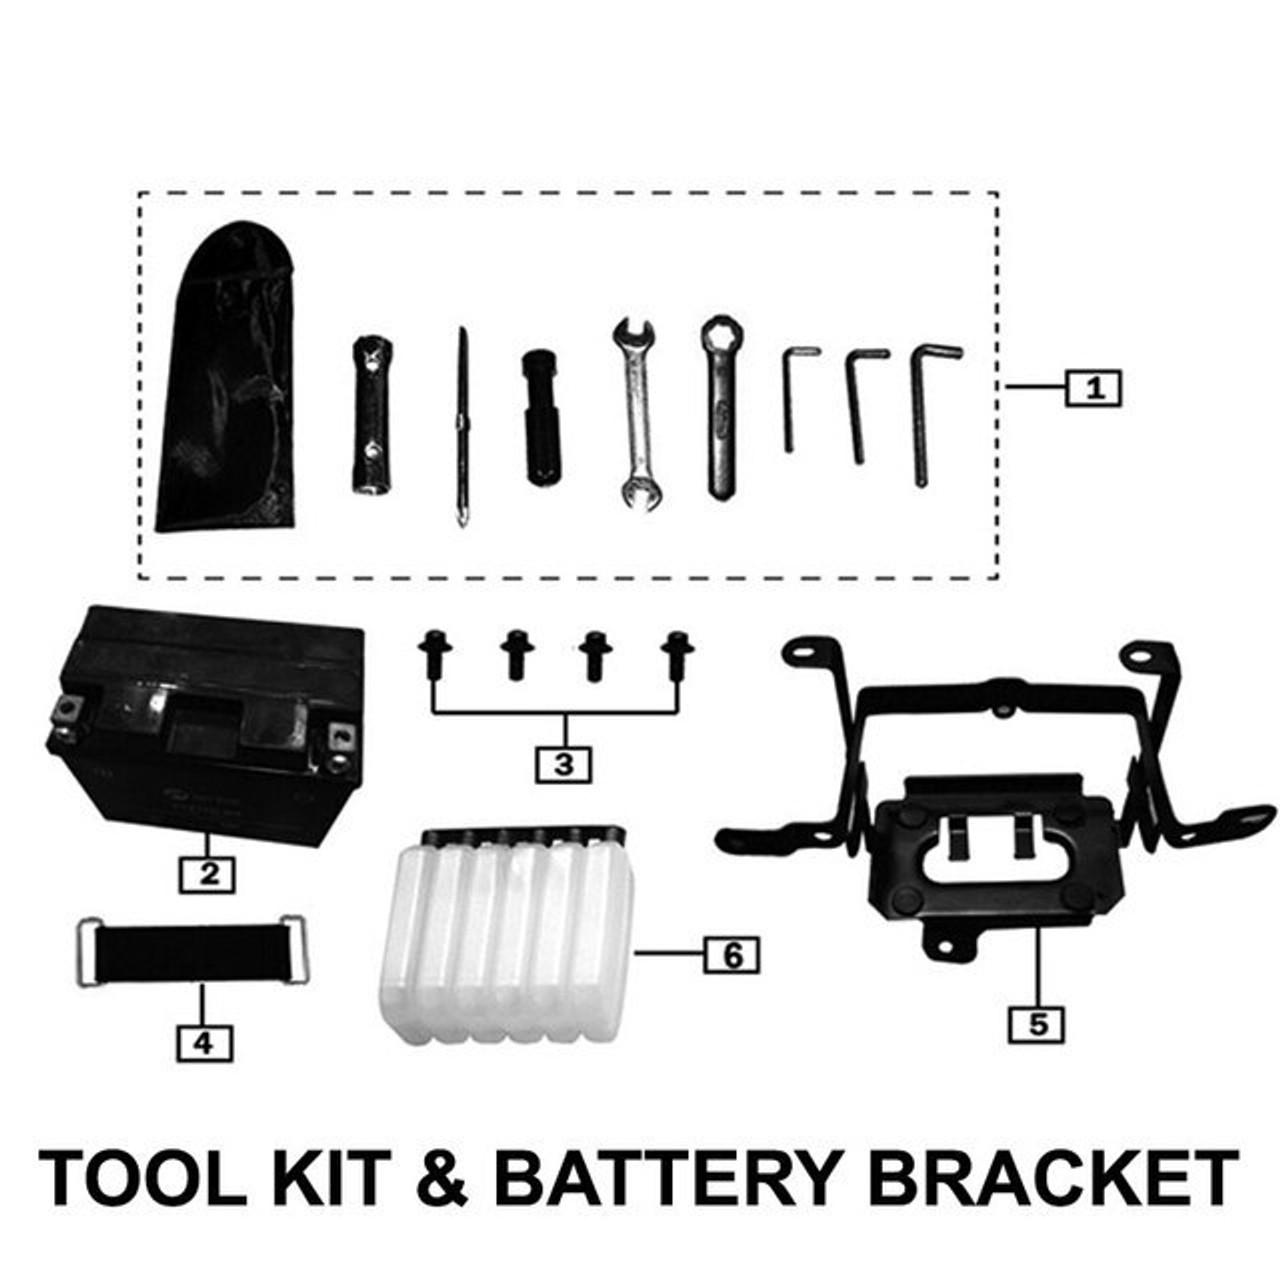 TOOLS & BATTERY BRACKET